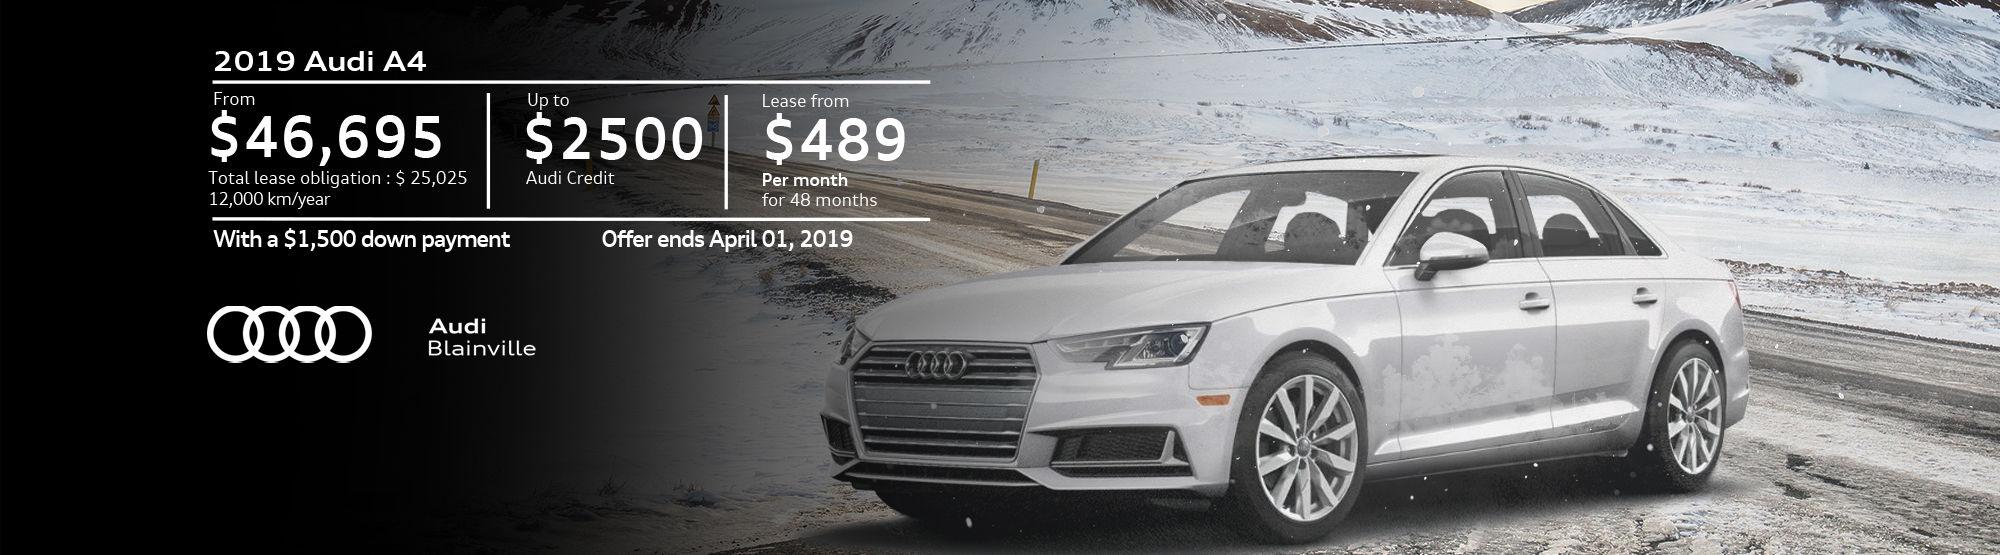 Audi A4 March 2019